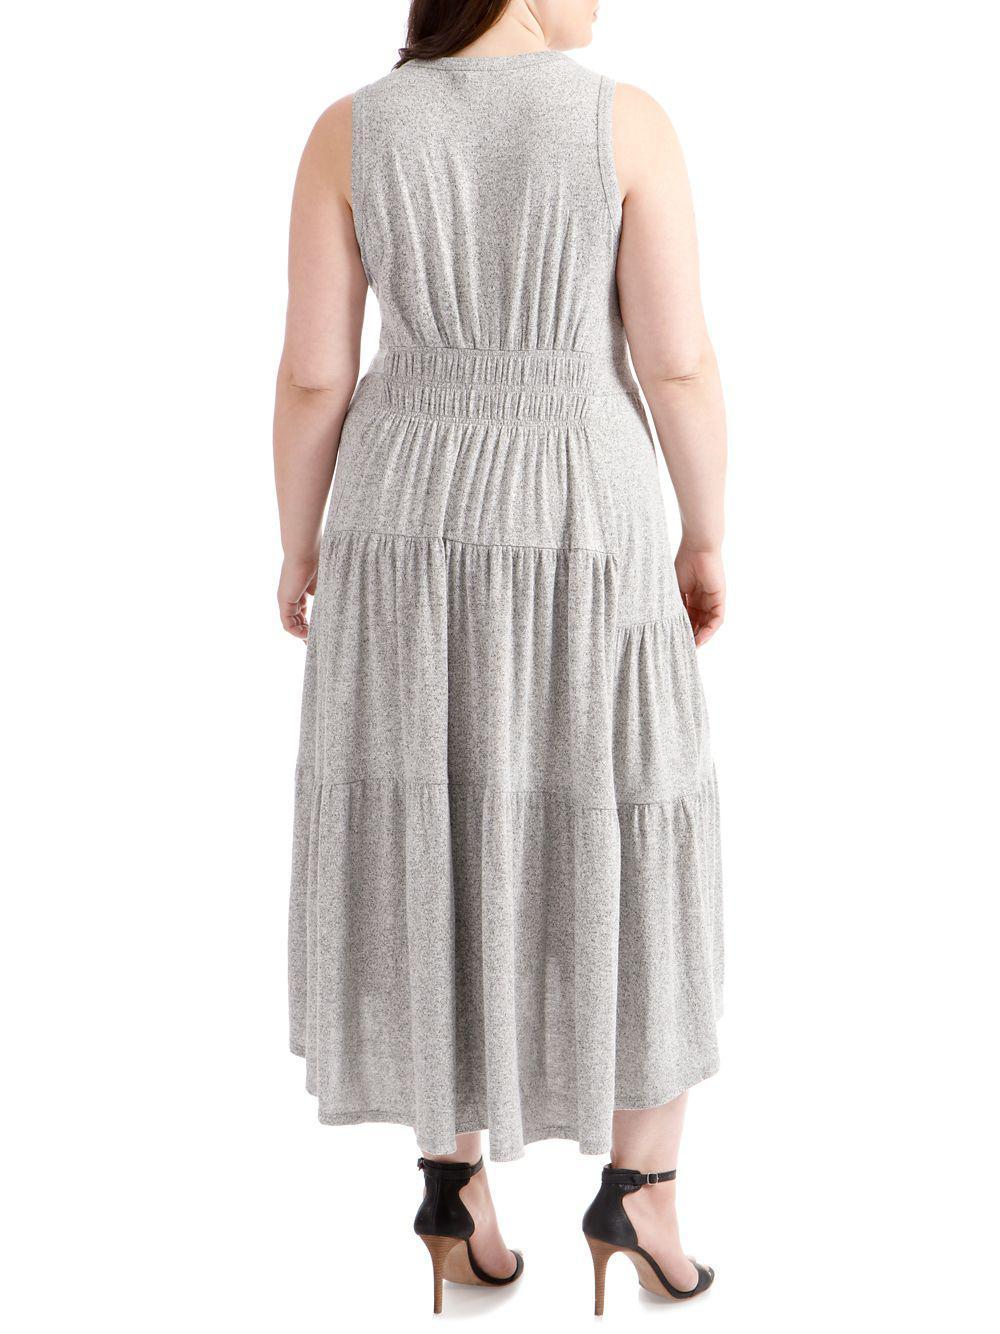 c037dab1da9 ... Gray Plus Open-back Smocked Dress - Lyst. View fullscreen